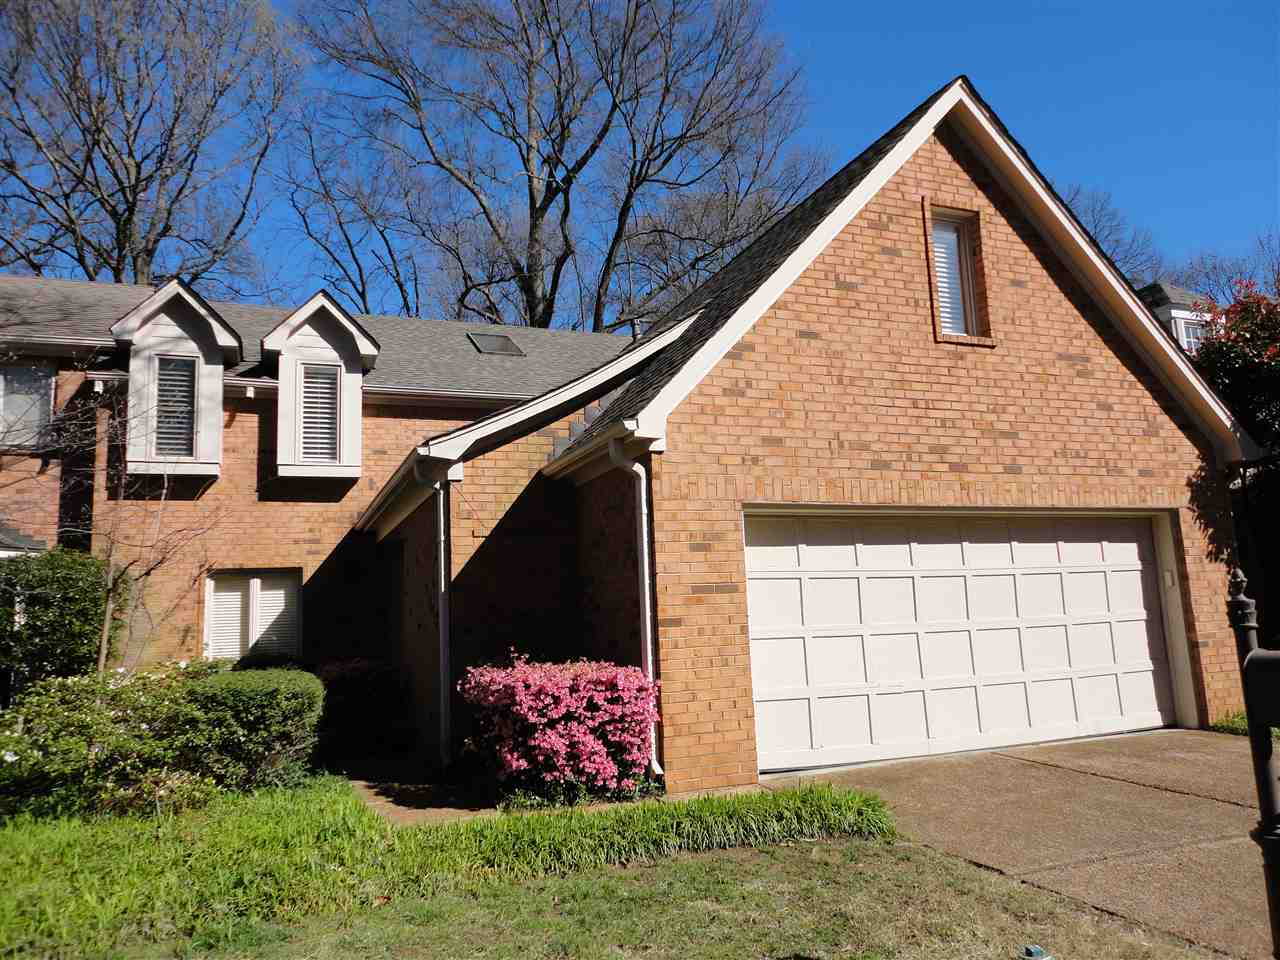 496 KINGSGATE CV, Memphis, TN 38117